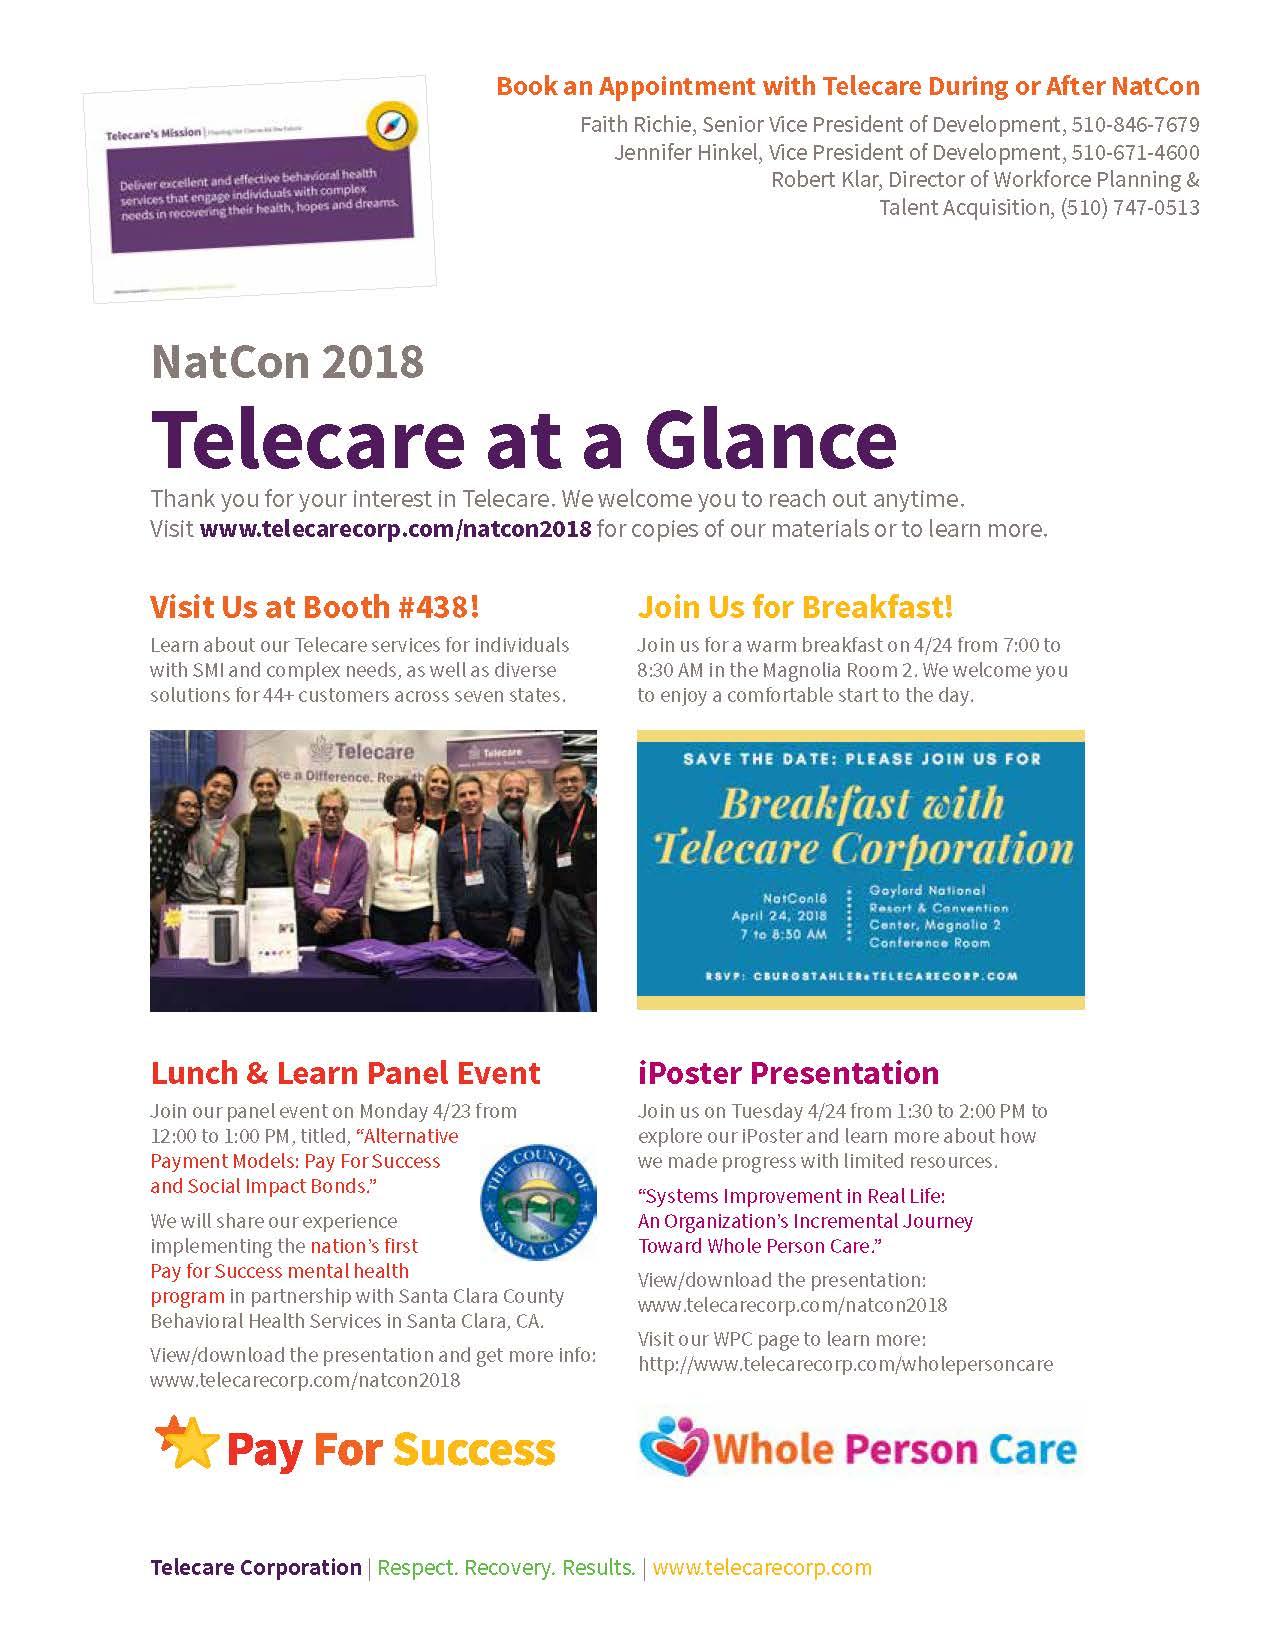 Telecare_NatCon2018_Flyer_vFinal_Page_1.jpg